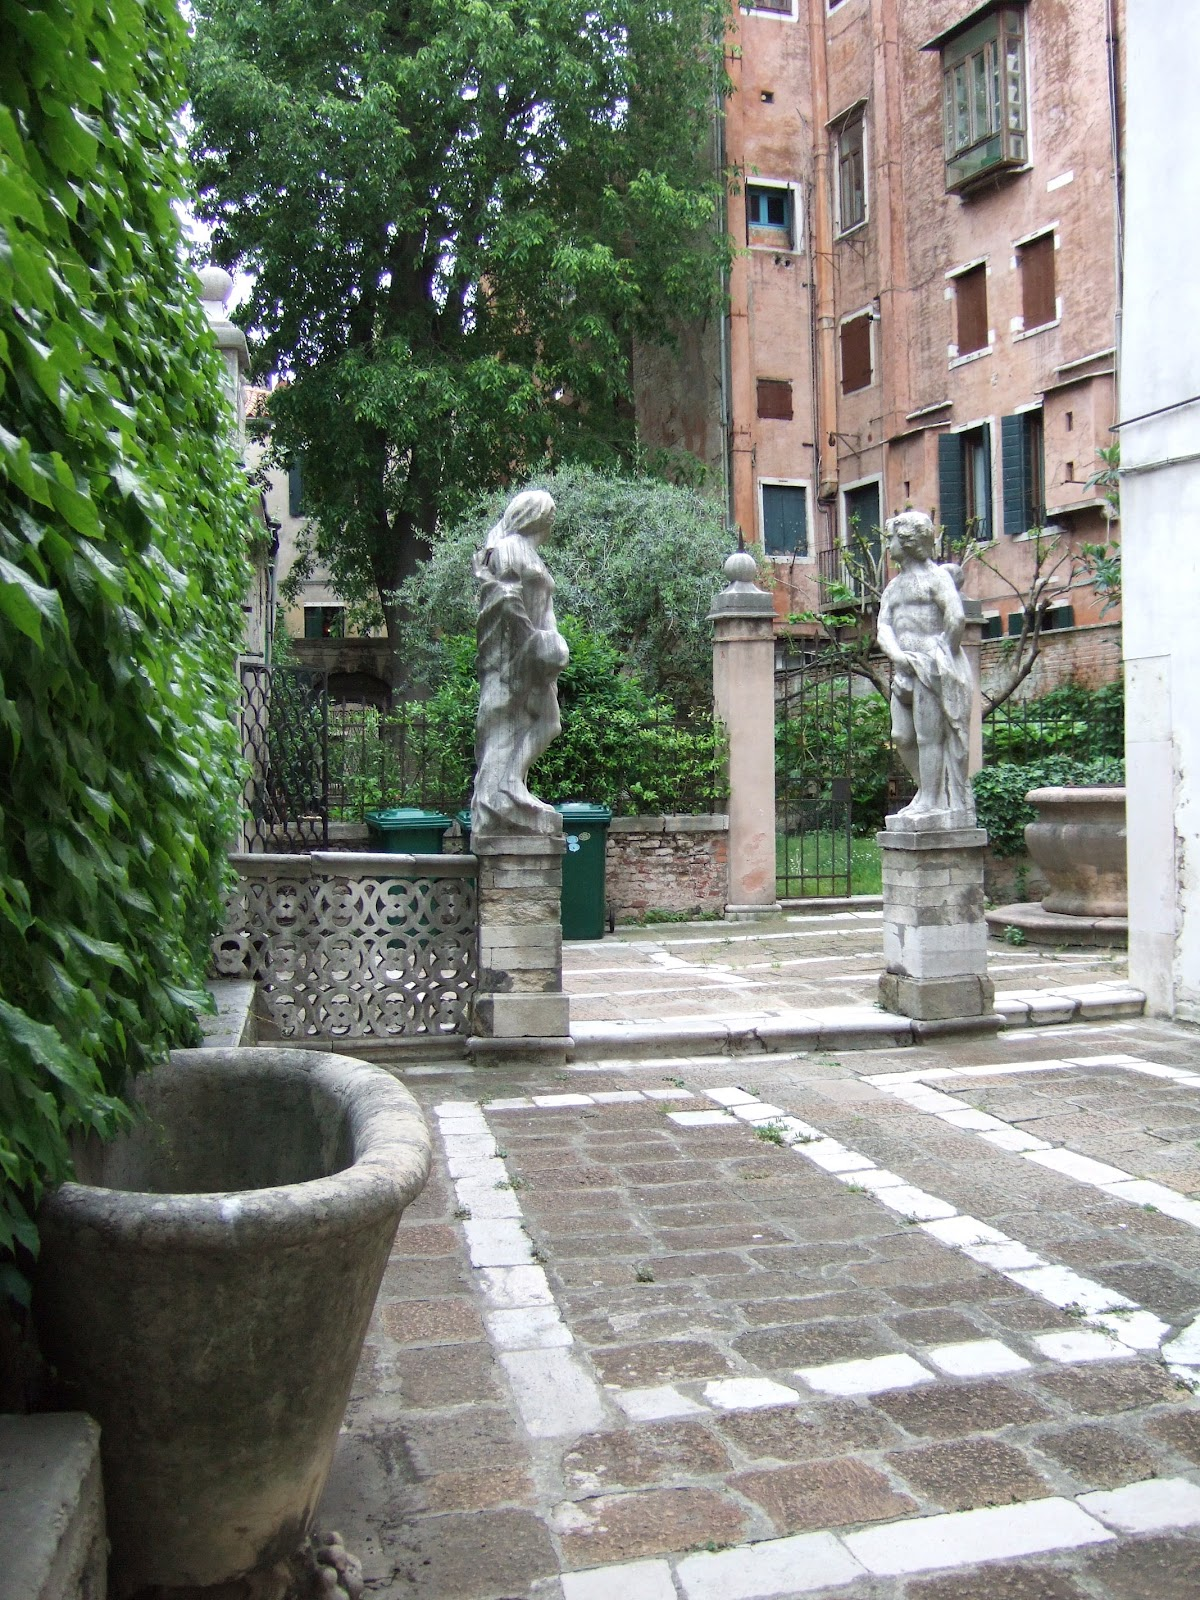 Venise c t jardin le consulat de france palazzo for Giardini a venise